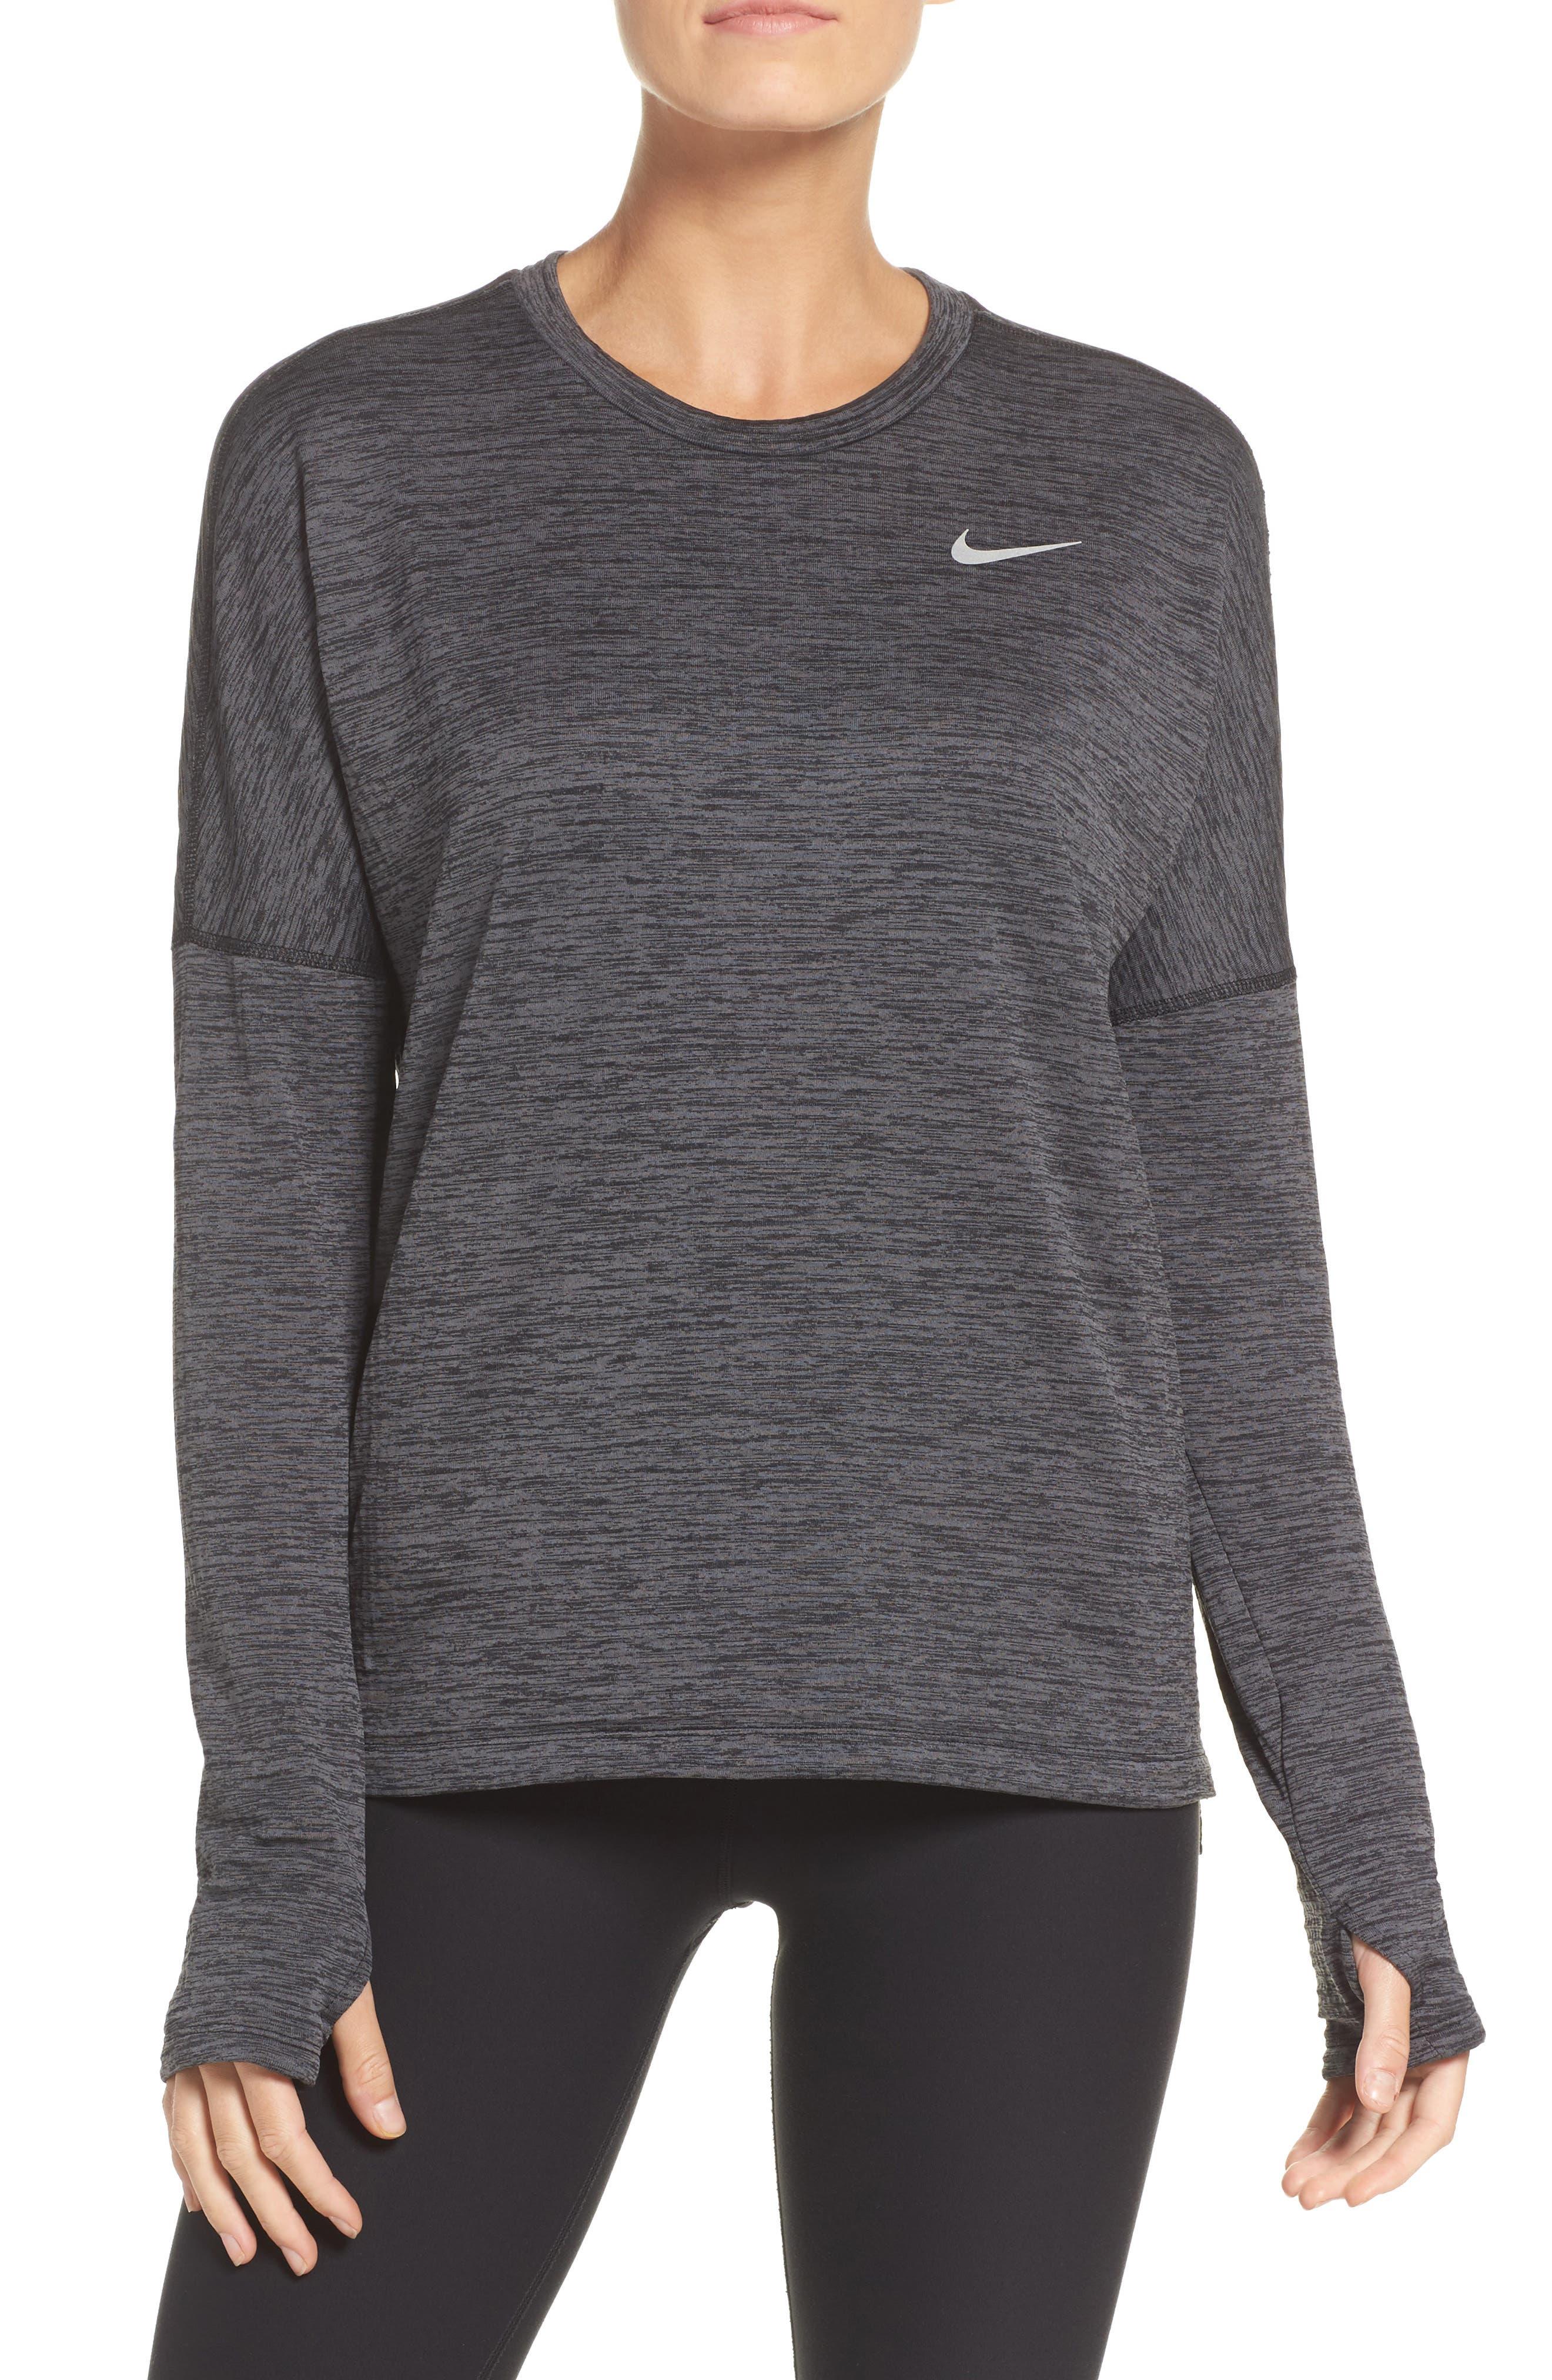 Main Image - Nike Therma Sphere Element Running Top